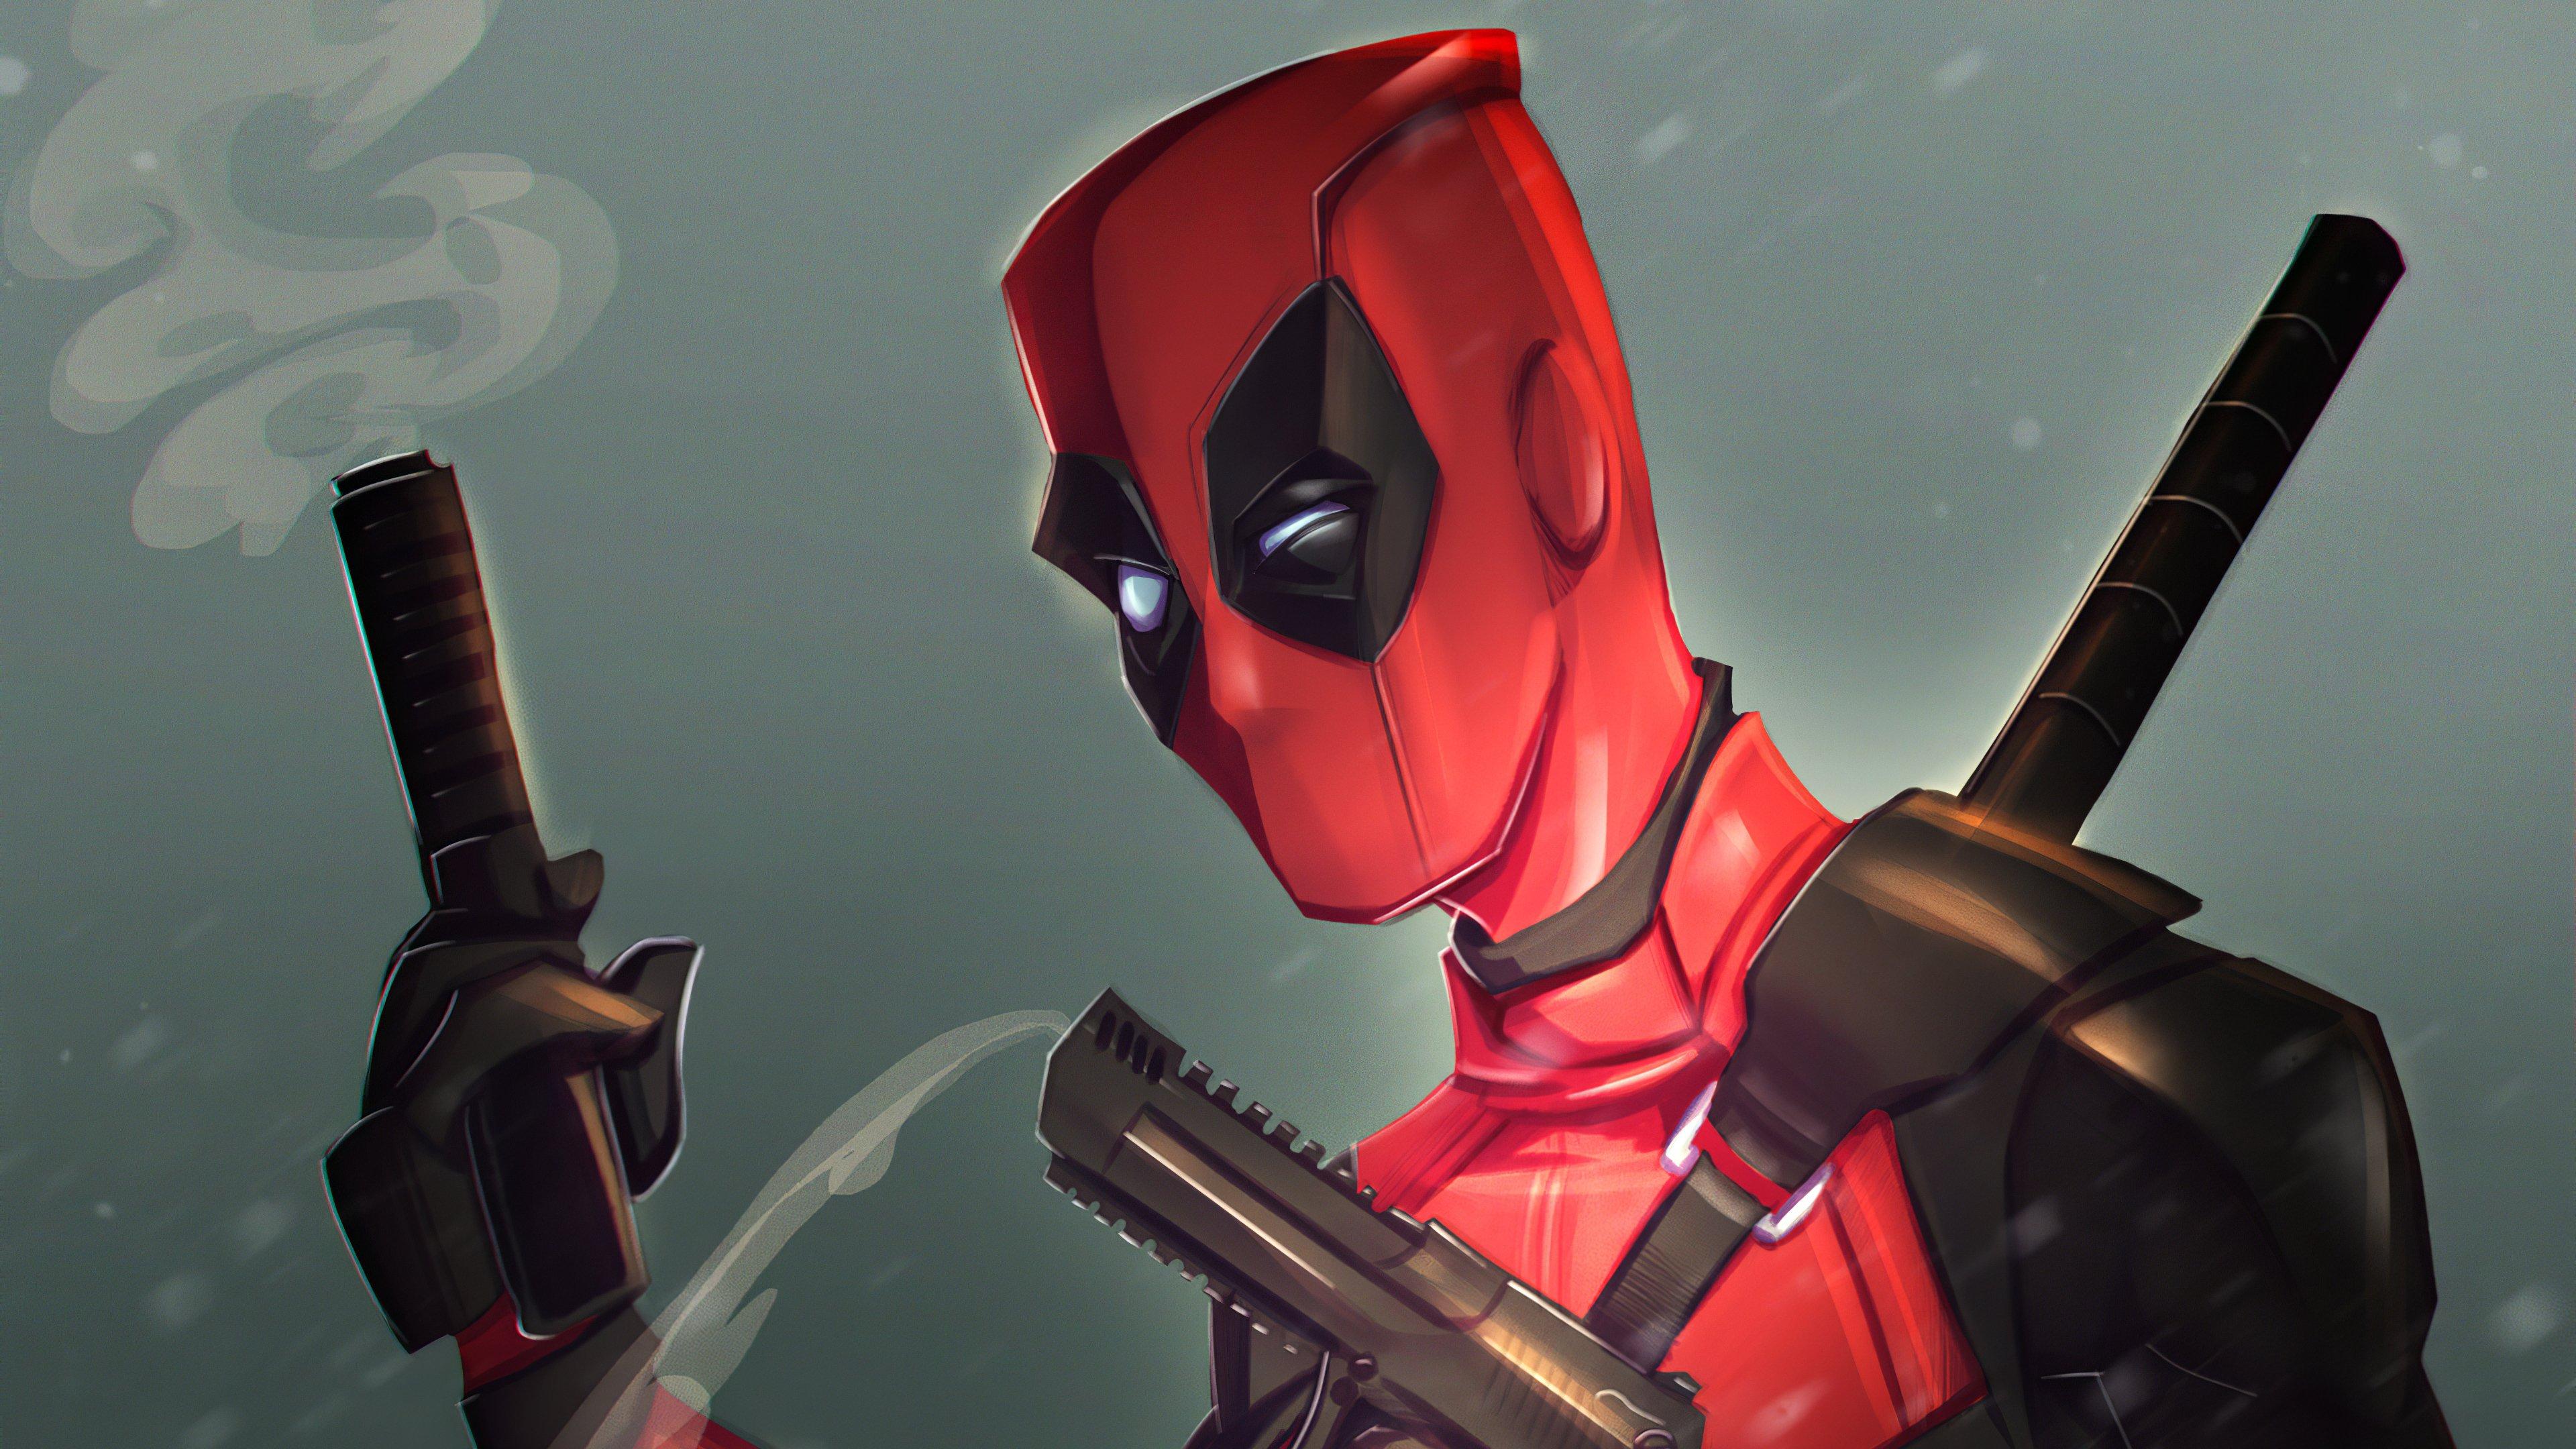 Fondos de pantalla Deadpool Artwork